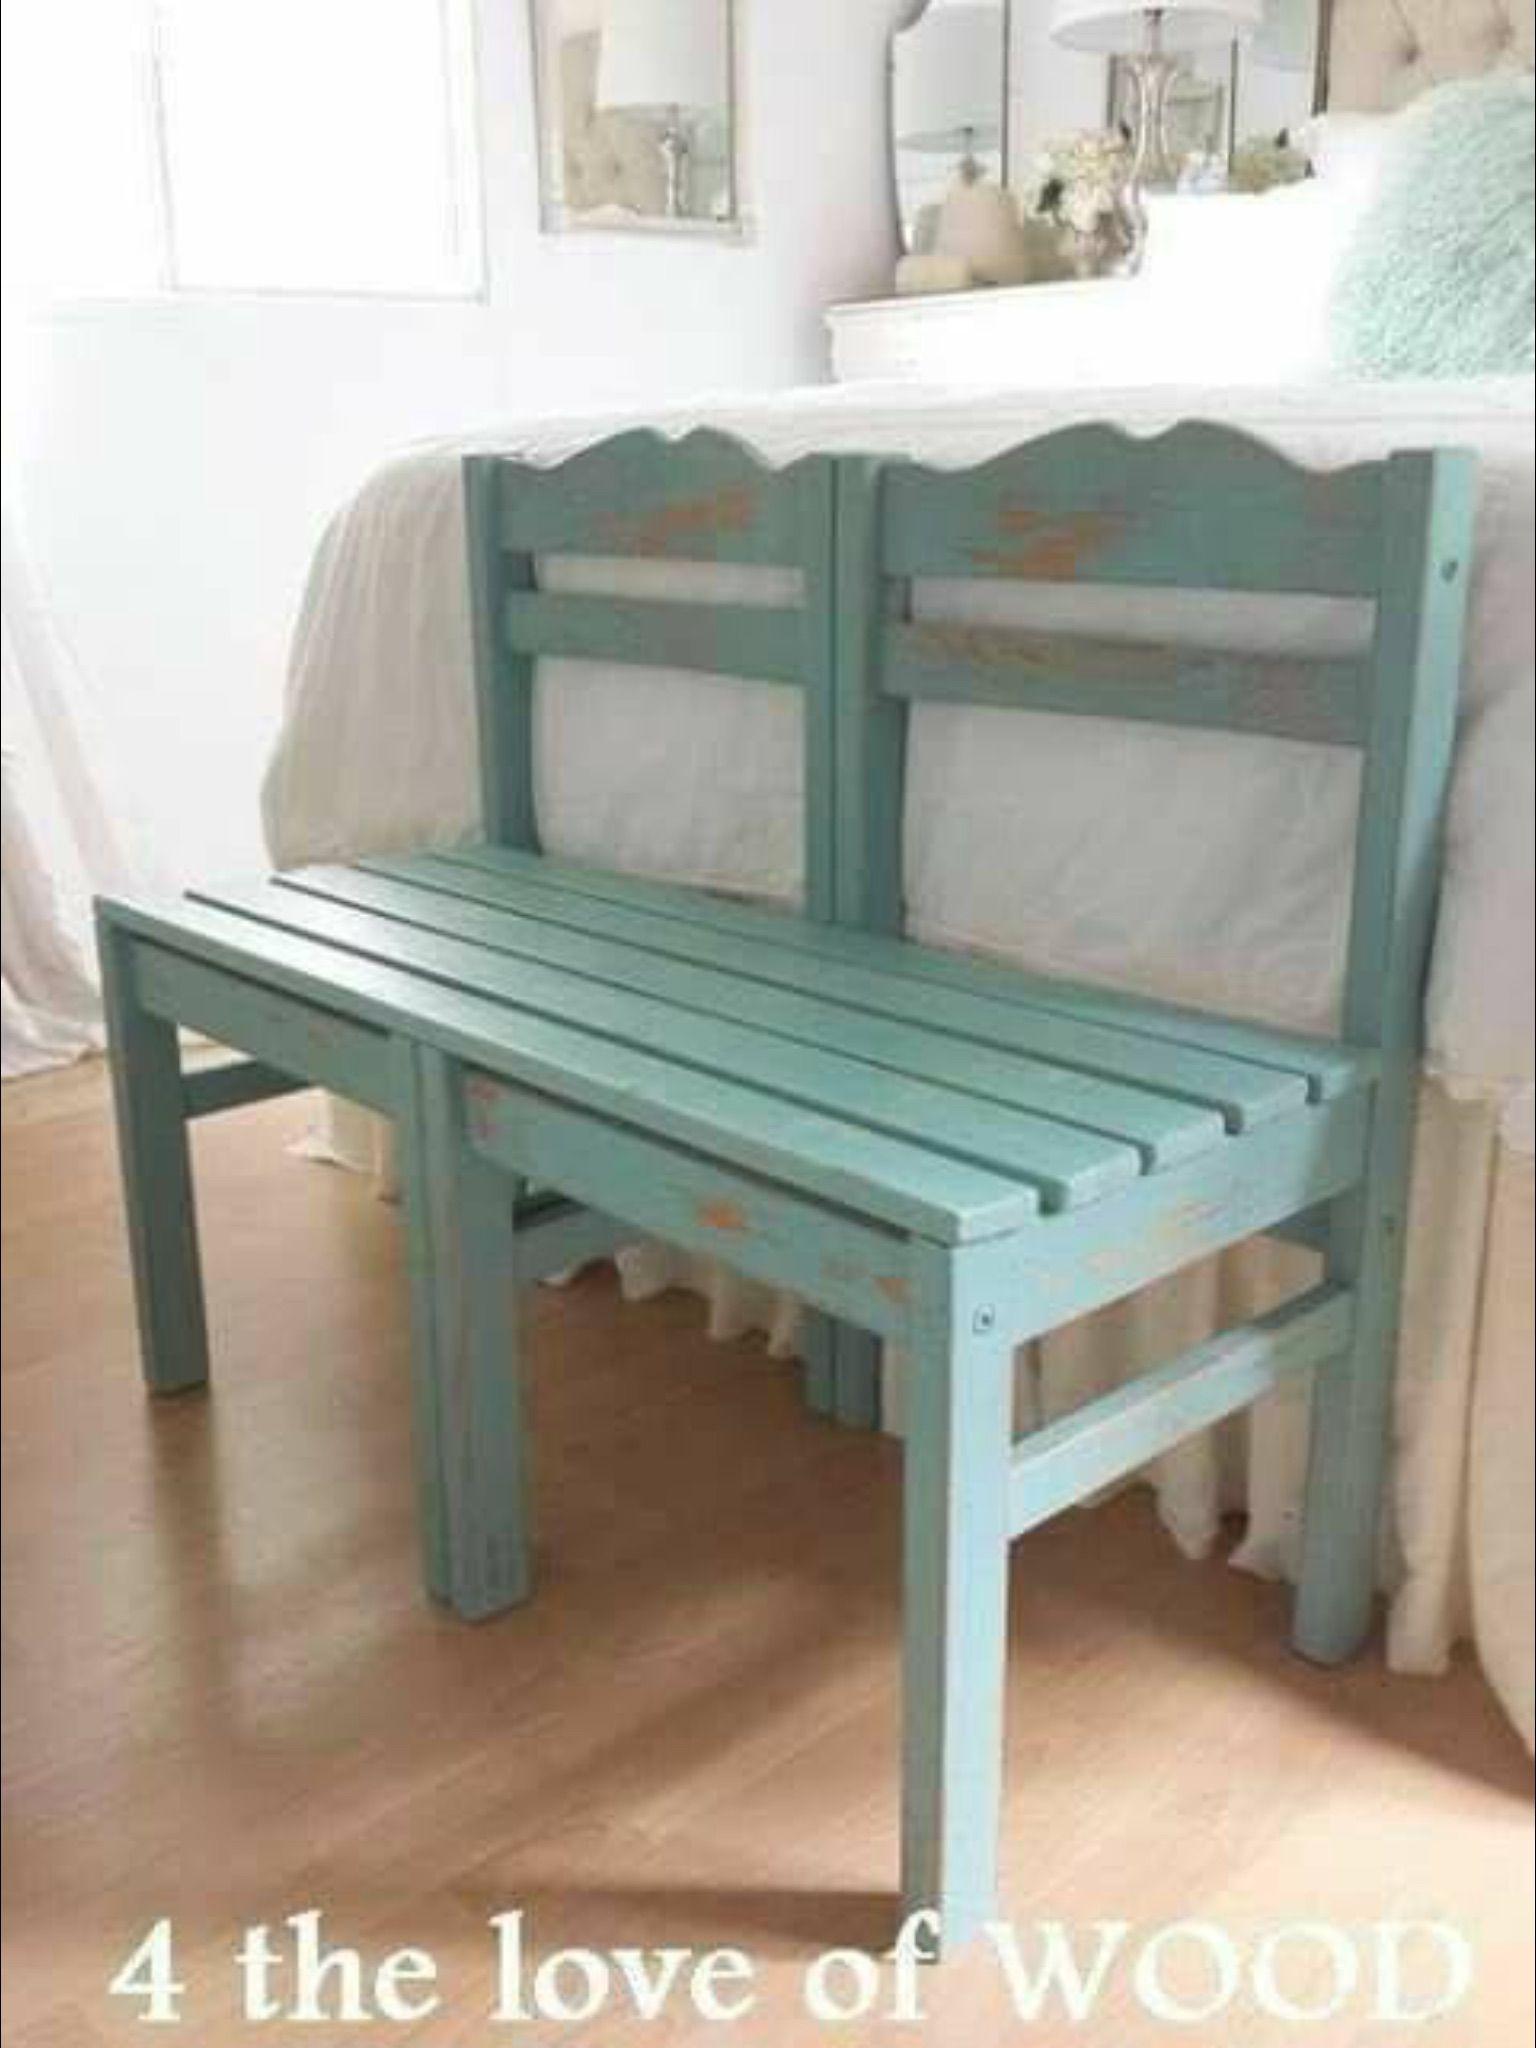 pin von jakagr auf have a seat pinterest m bel diy m bel und holz. Black Bedroom Furniture Sets. Home Design Ideas